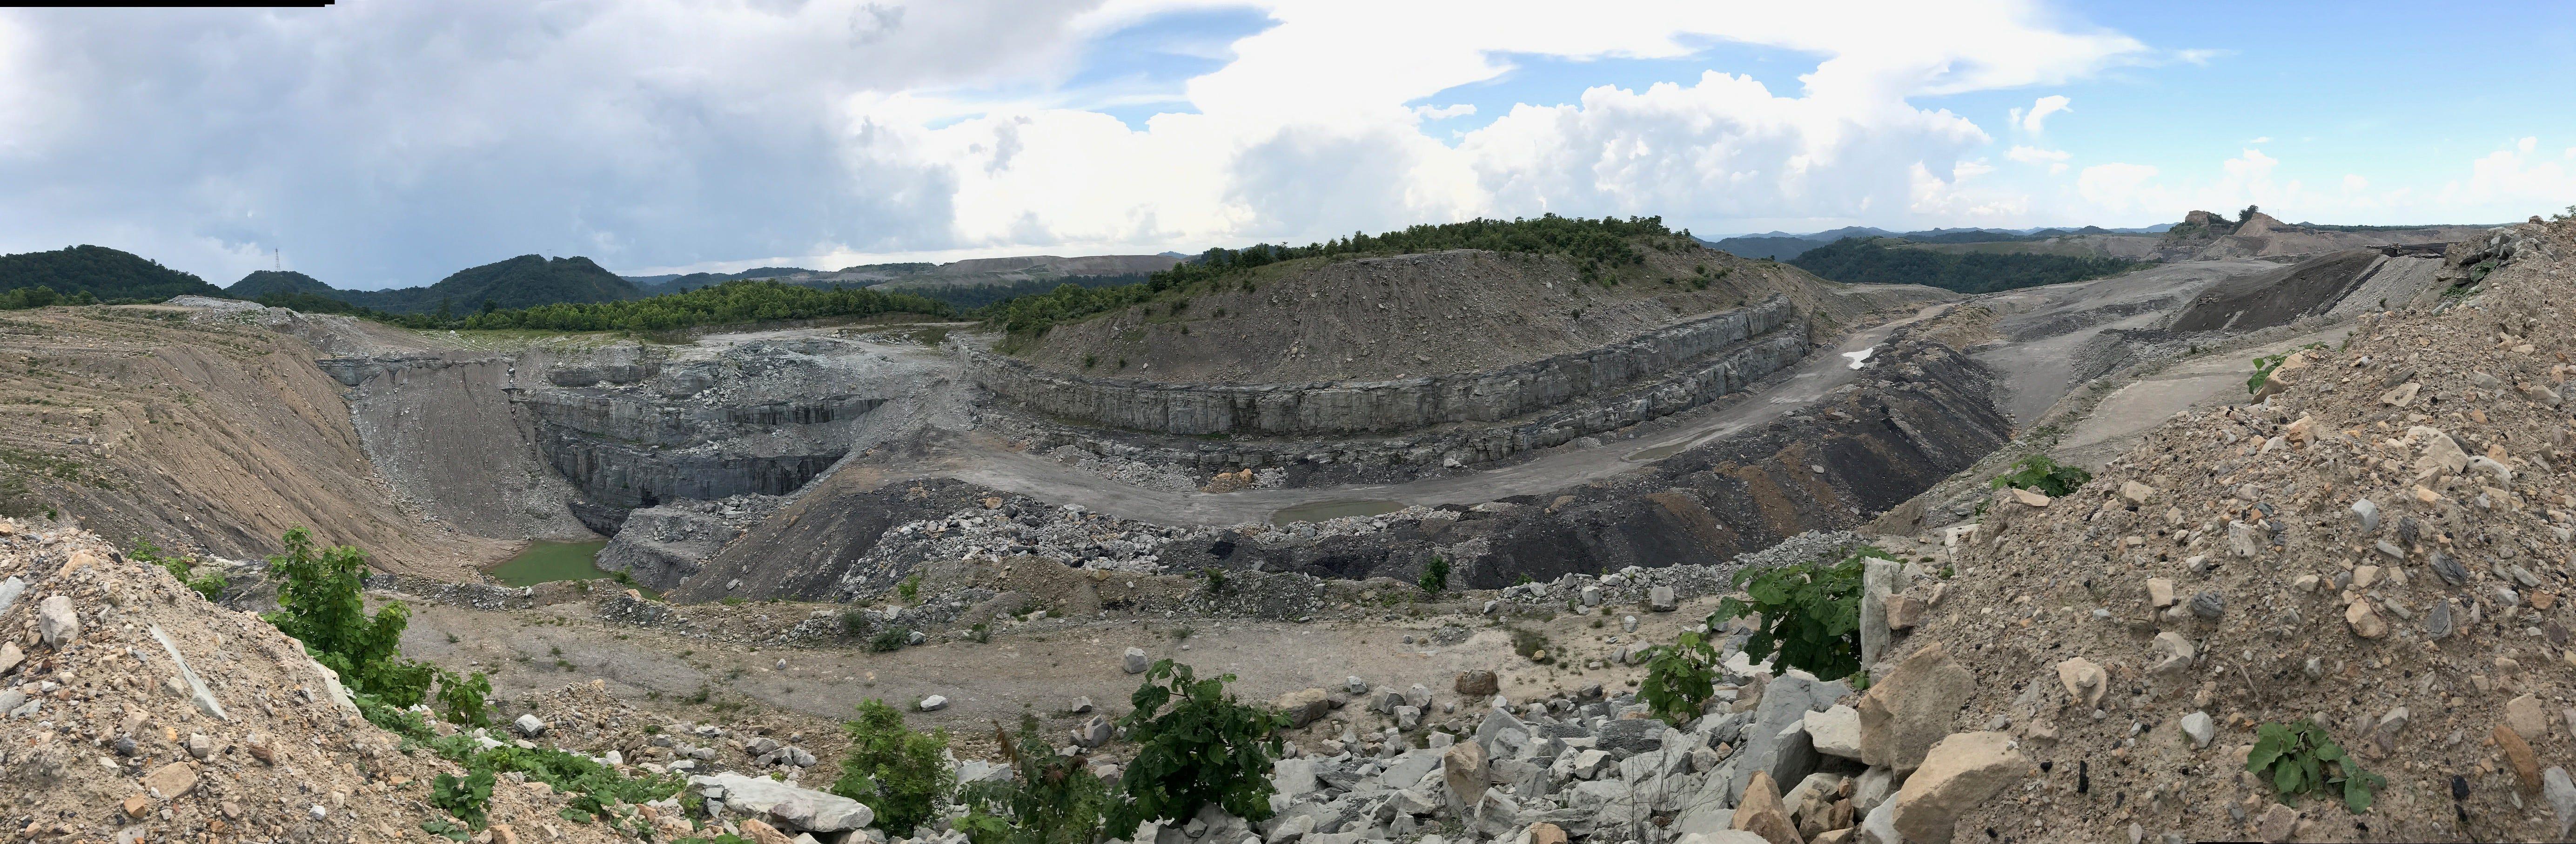 Strip mining permits in kentucky